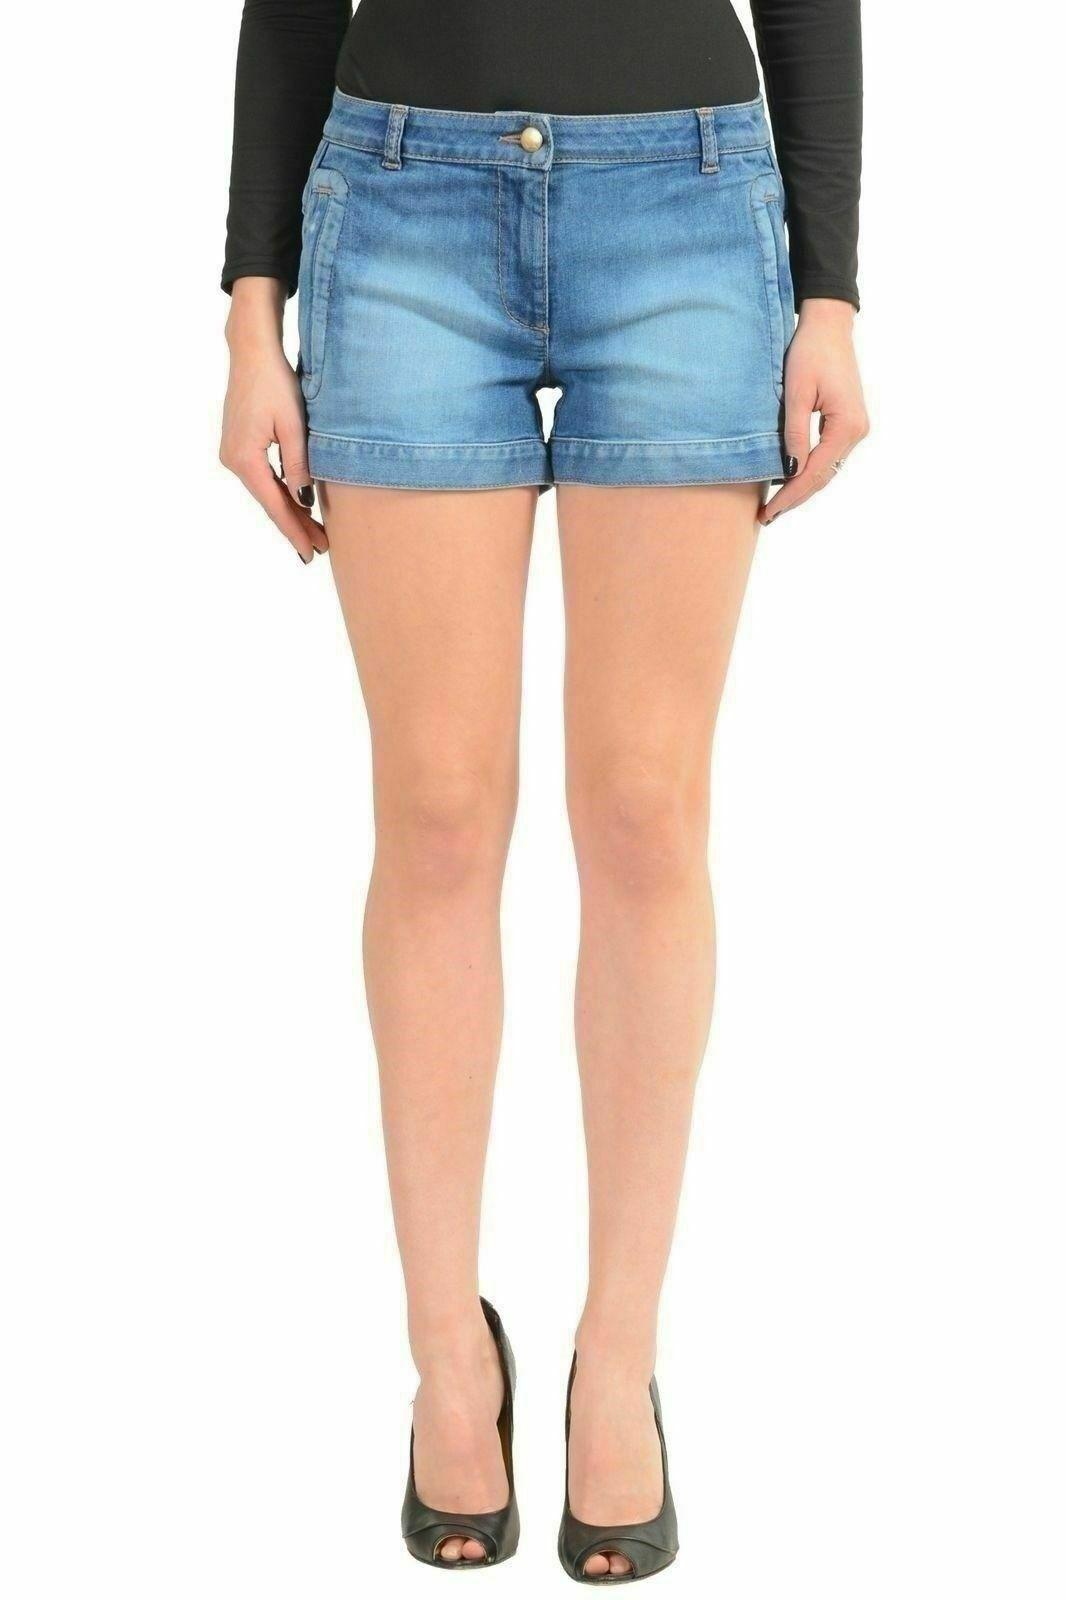 Just Cavalli bluee Denim Women's Casual Shorts US S IT 40